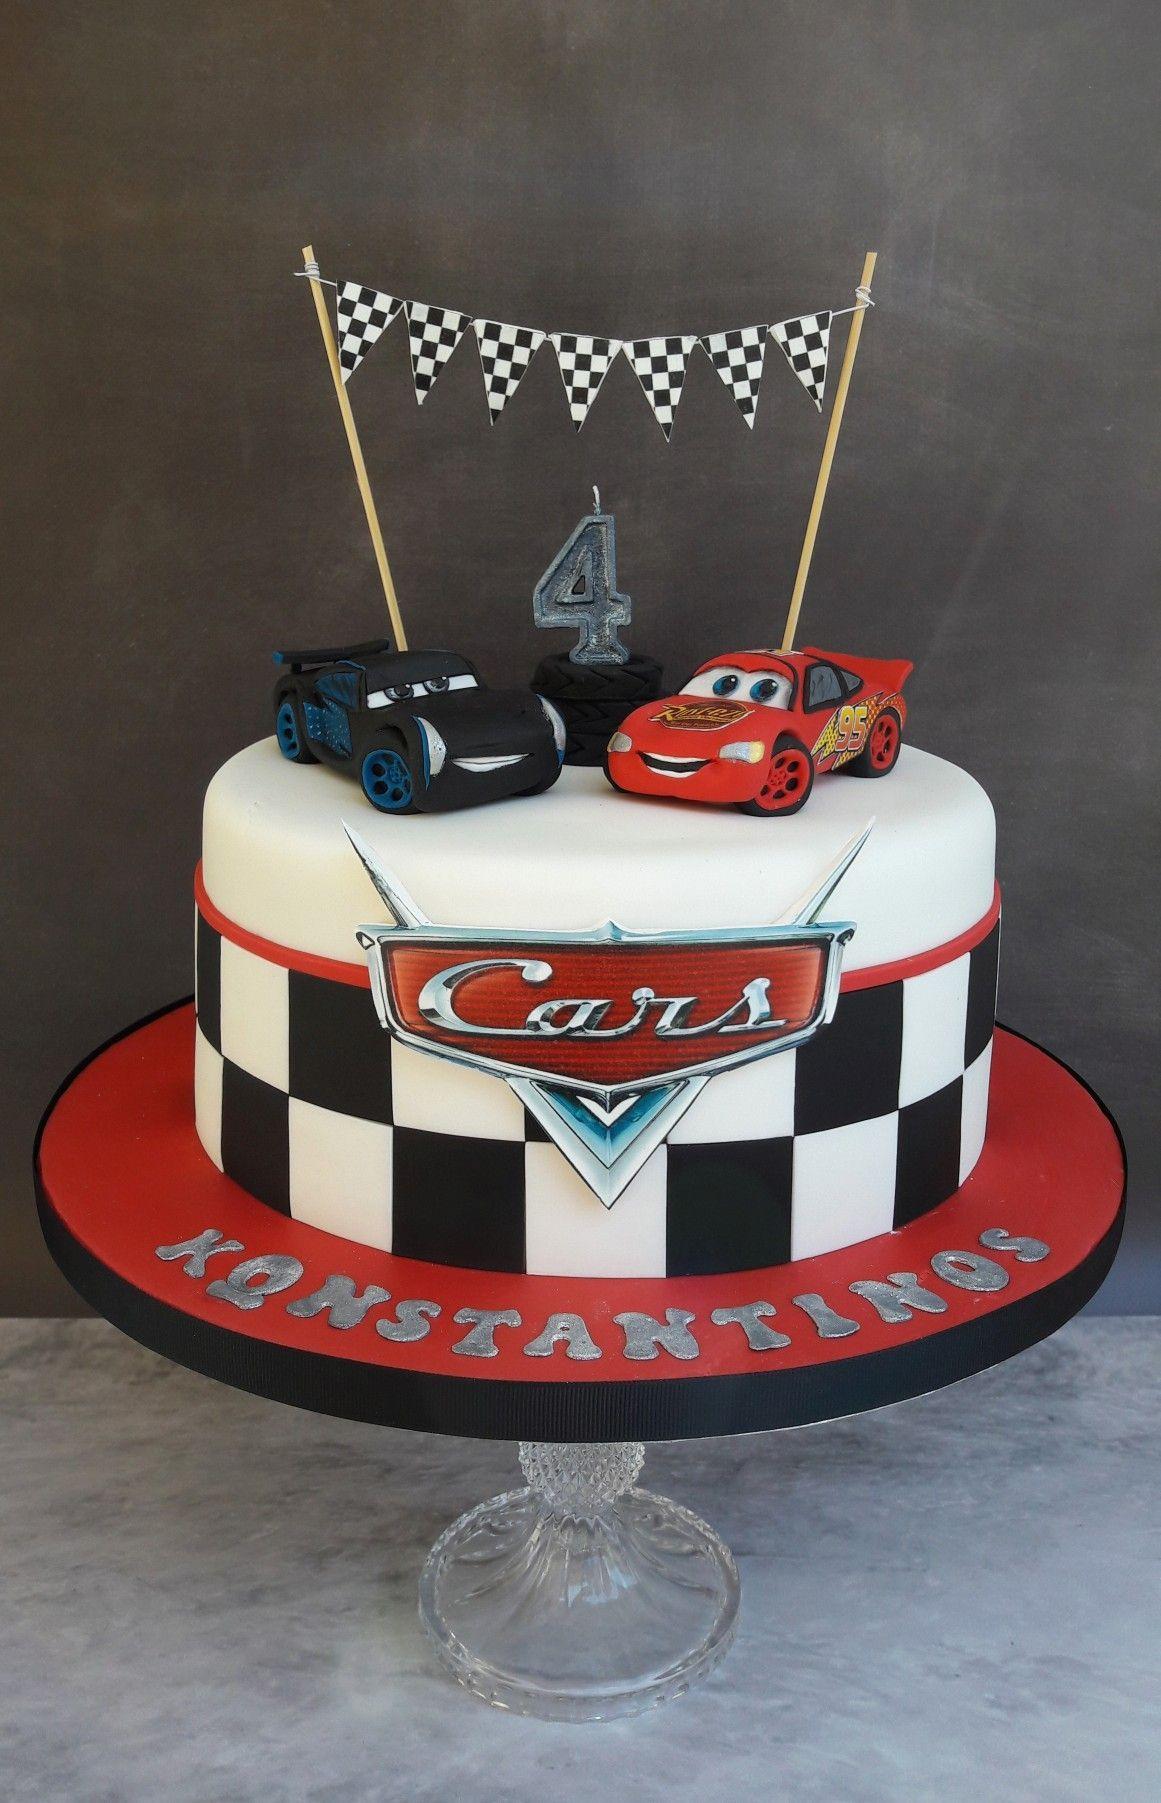 20 Excellent Photo Of Cars Birthday Cake Lightning Mcqueen Birthday Cake Cars Birthday Cake Disney Birthday Cakes